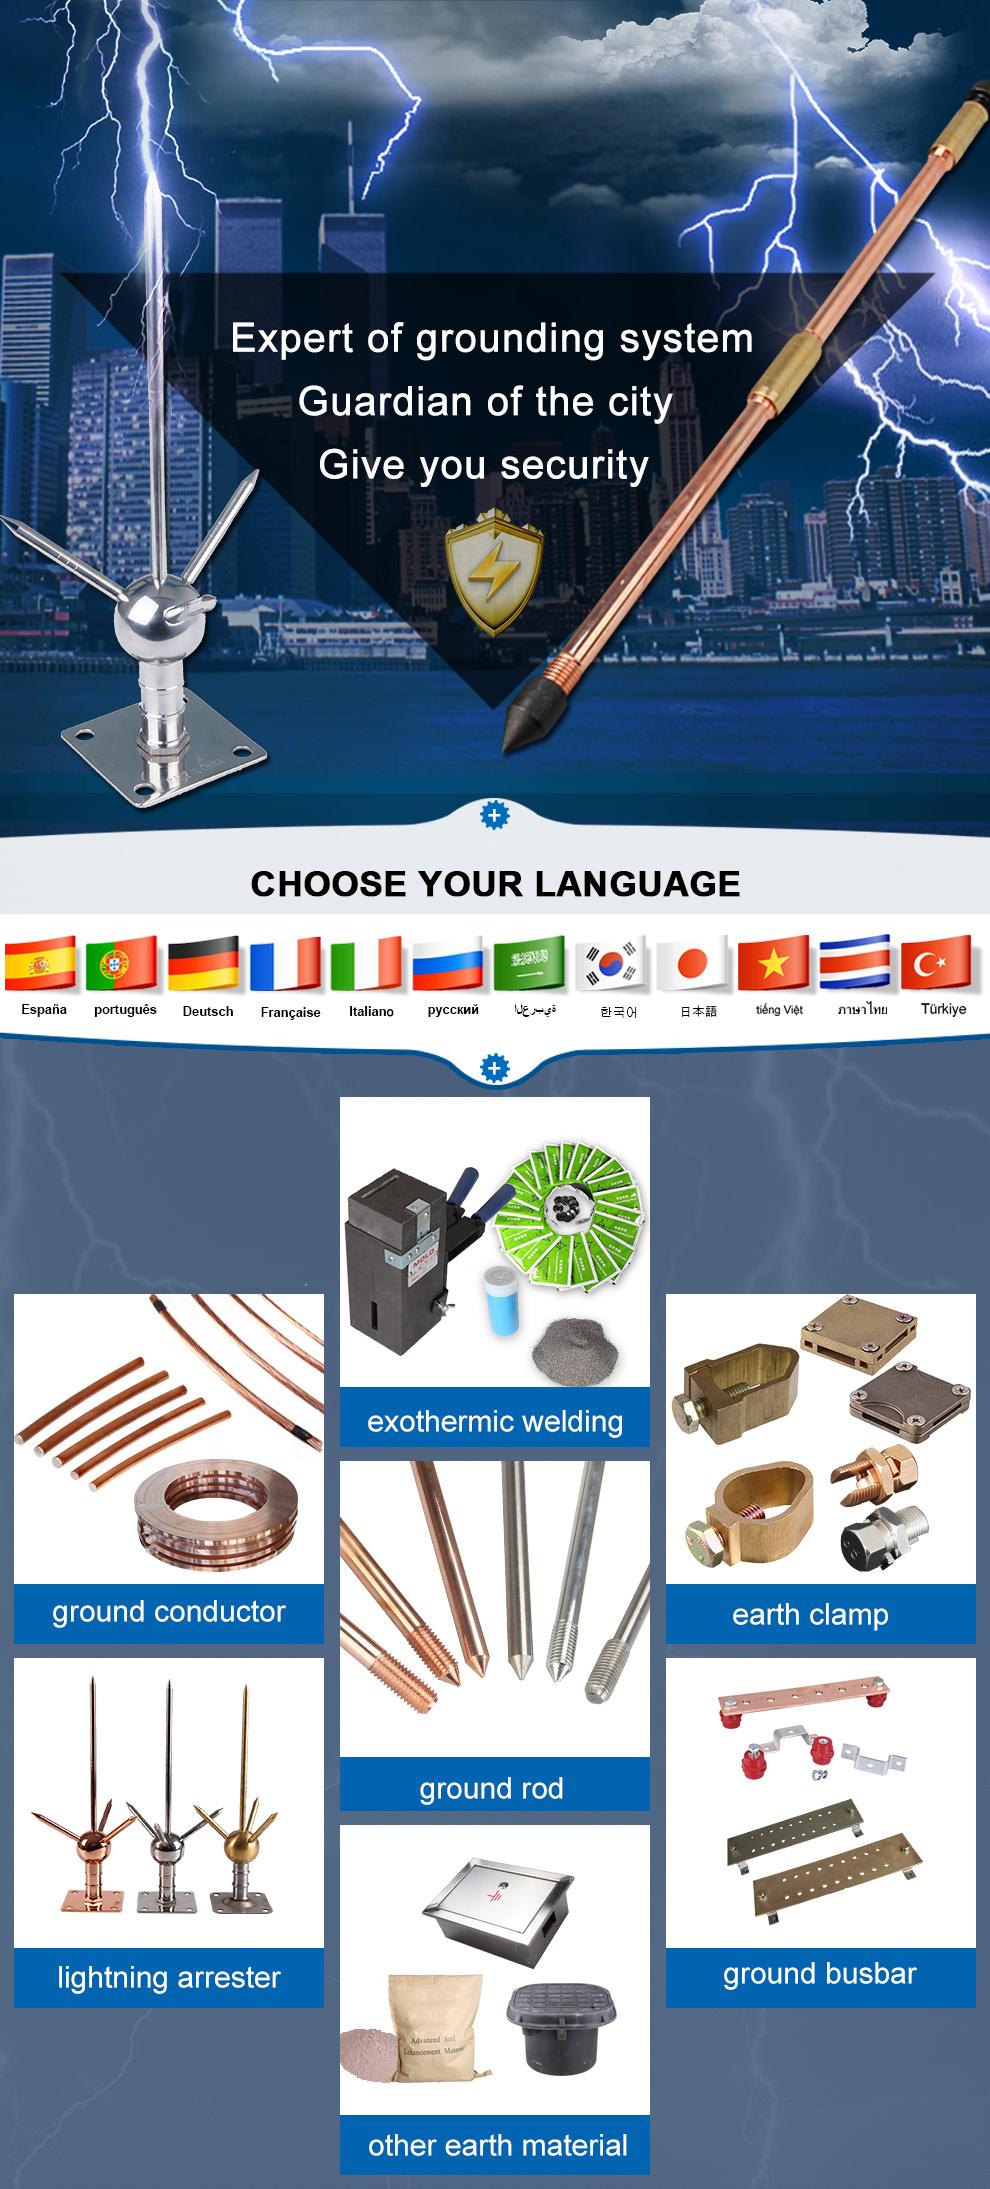 Shaoxing Bailijia Electric Co., Ltd. - Ground Rod